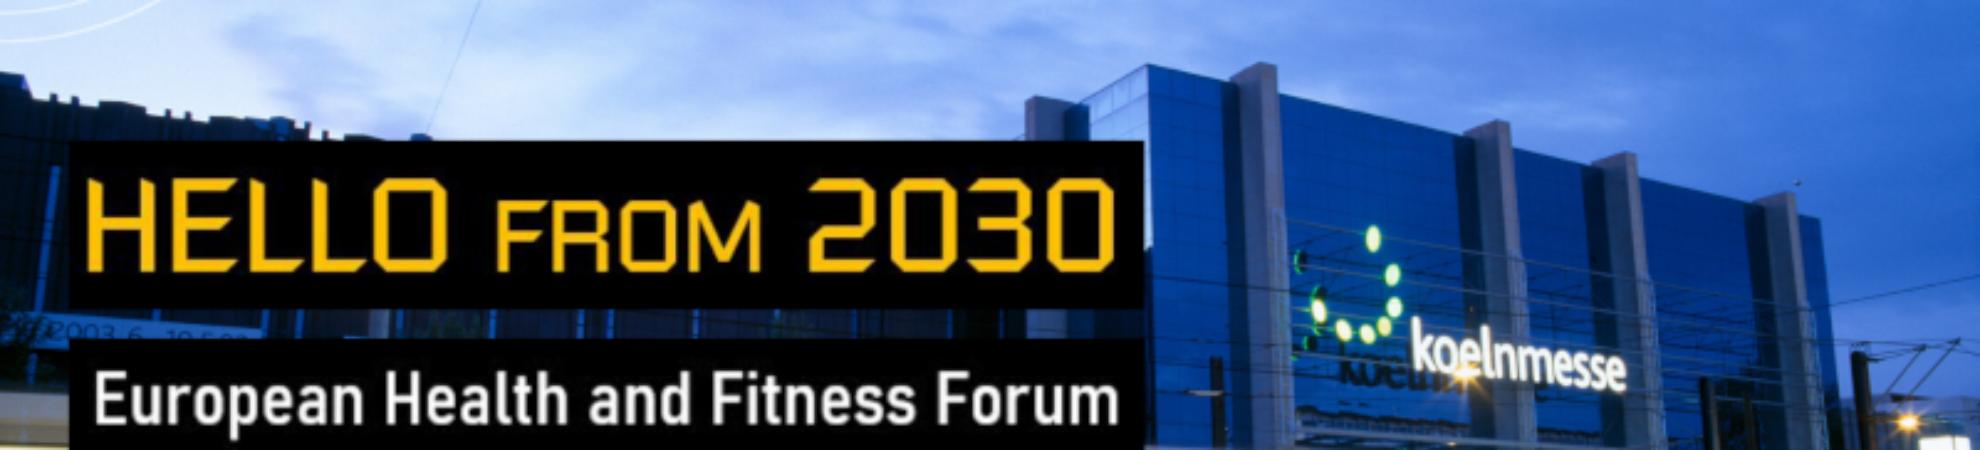 Imagen posster Europeactive EHFF 2020